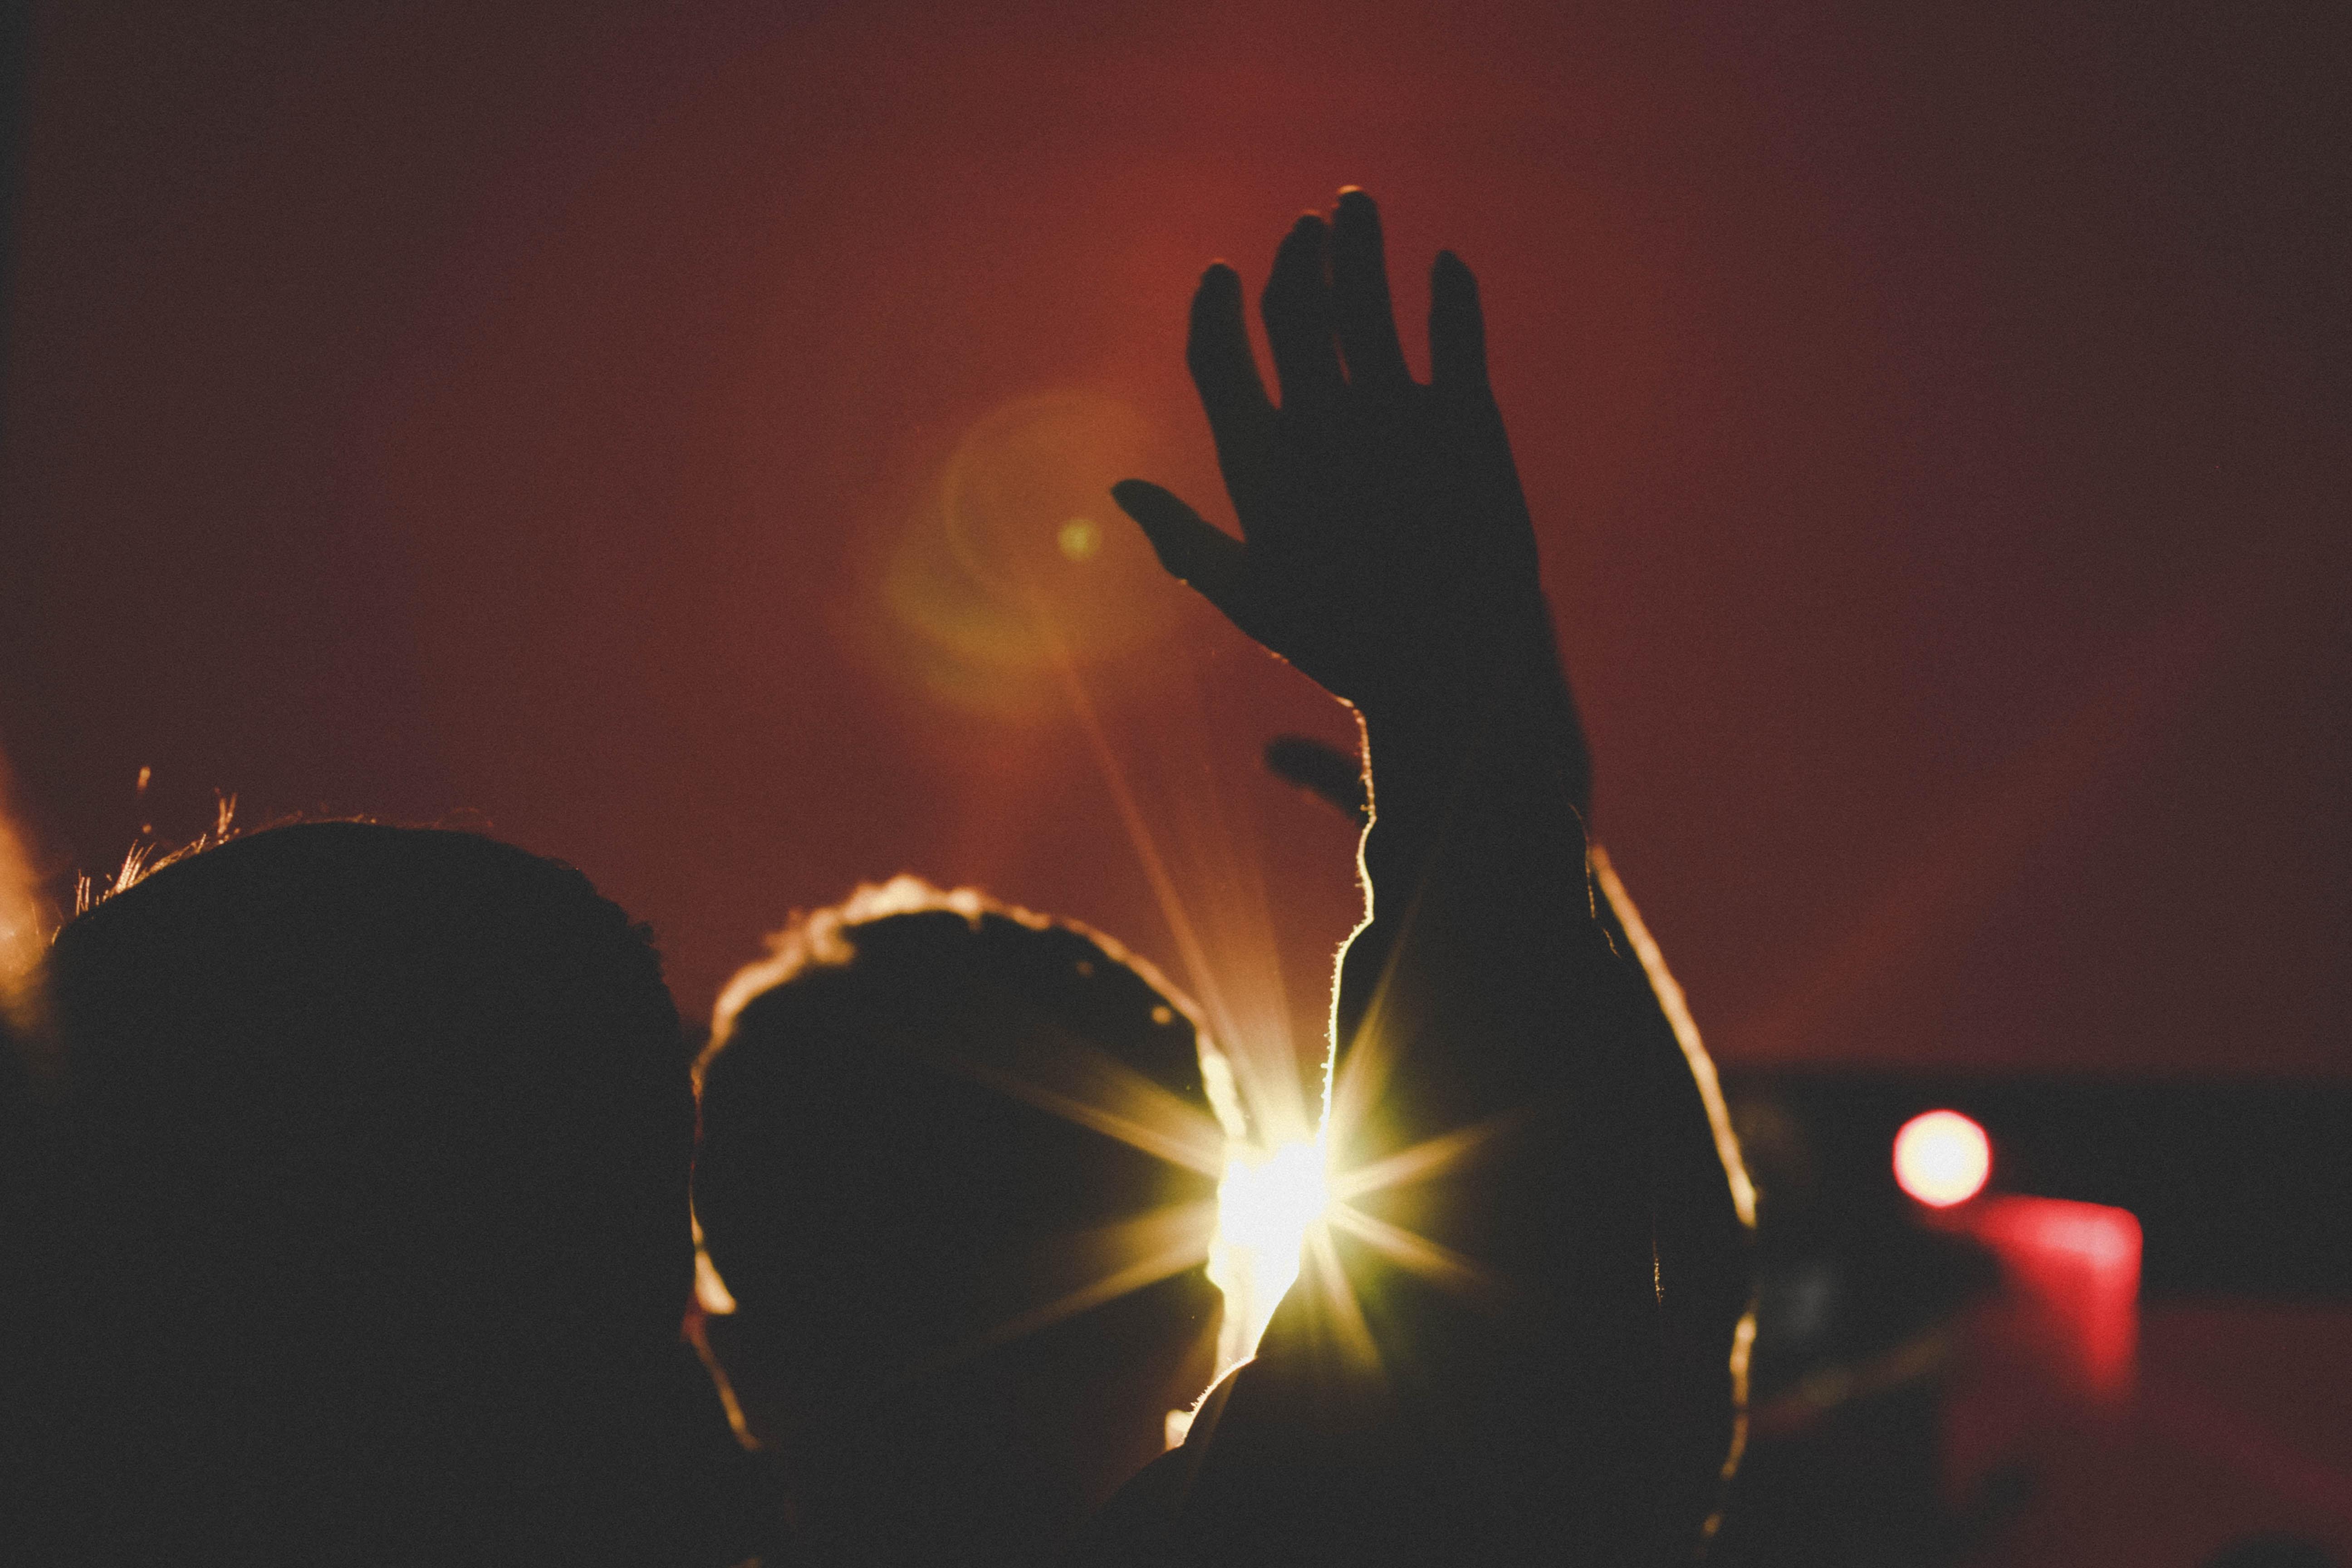 silhouette of man raising his hands inside deemed room